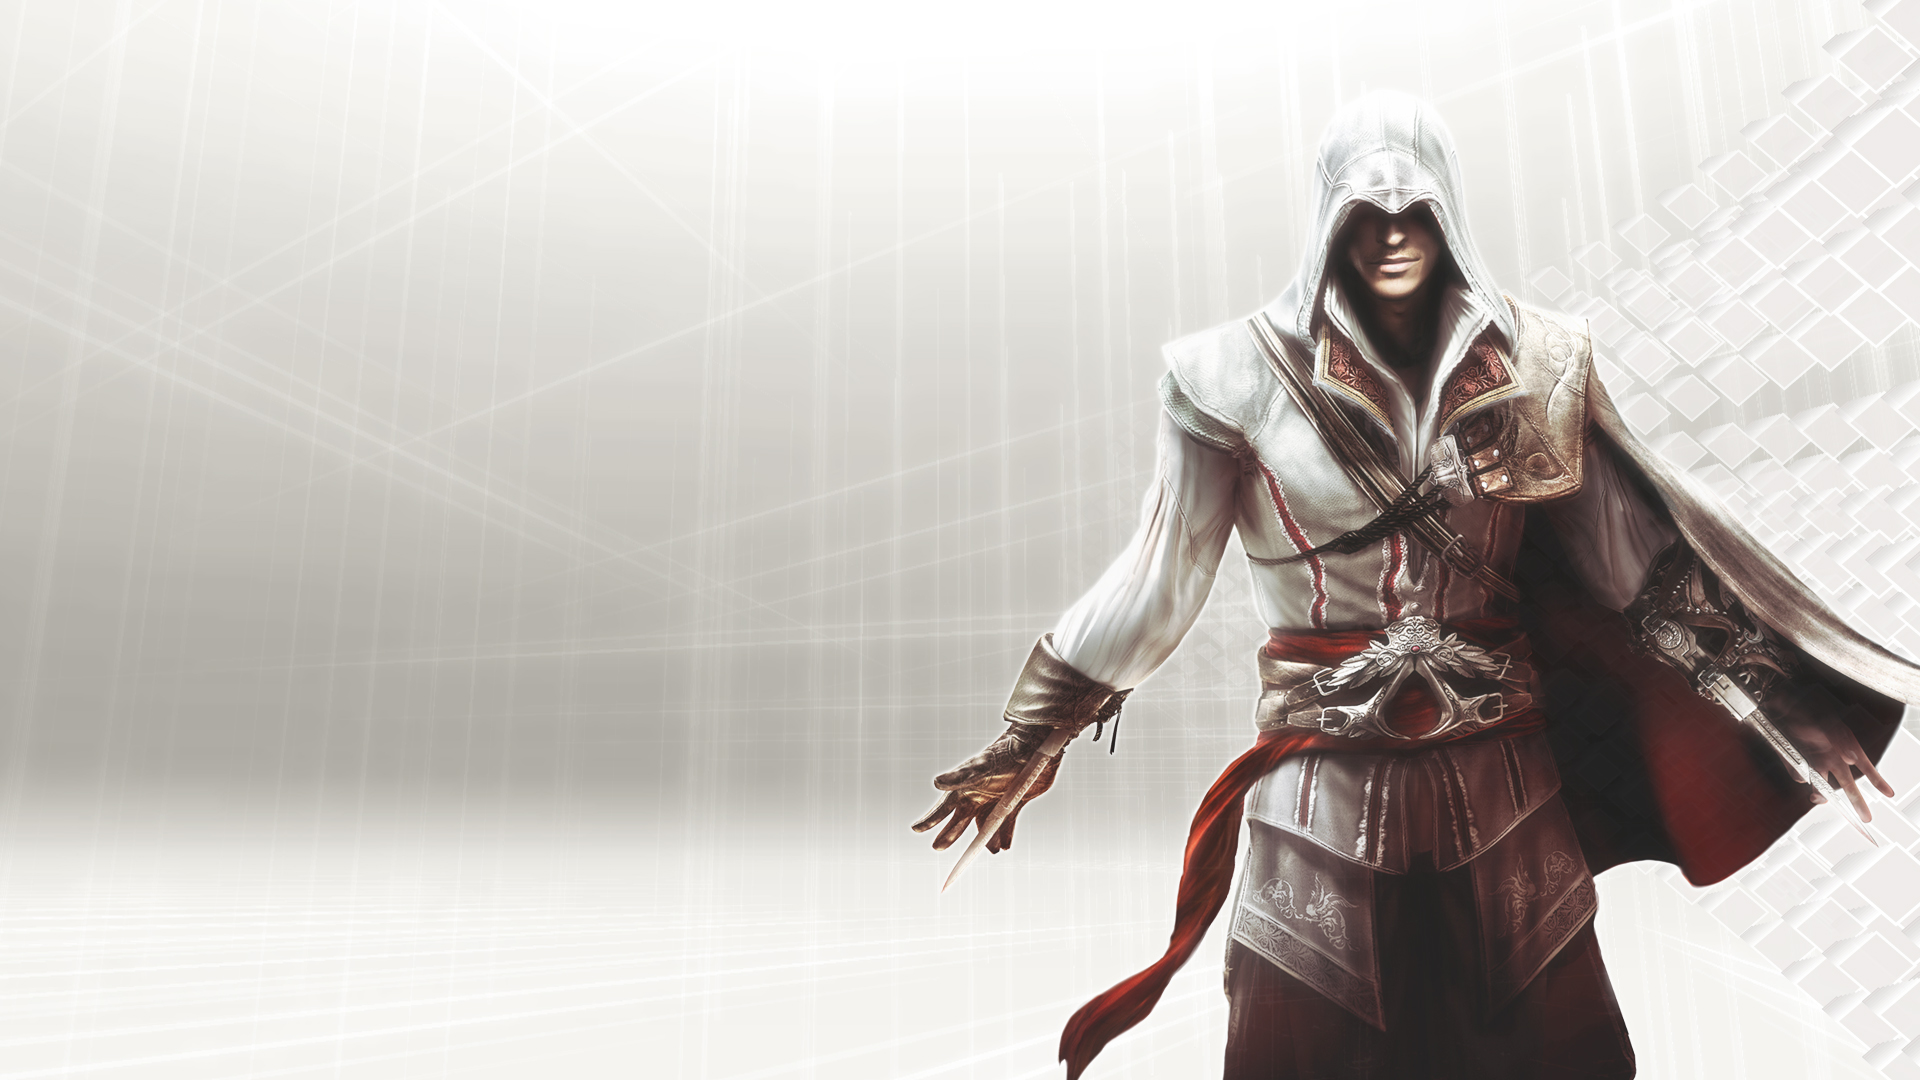 Assassins creed brotherhood hd wallpapers 1080p 1920x1080